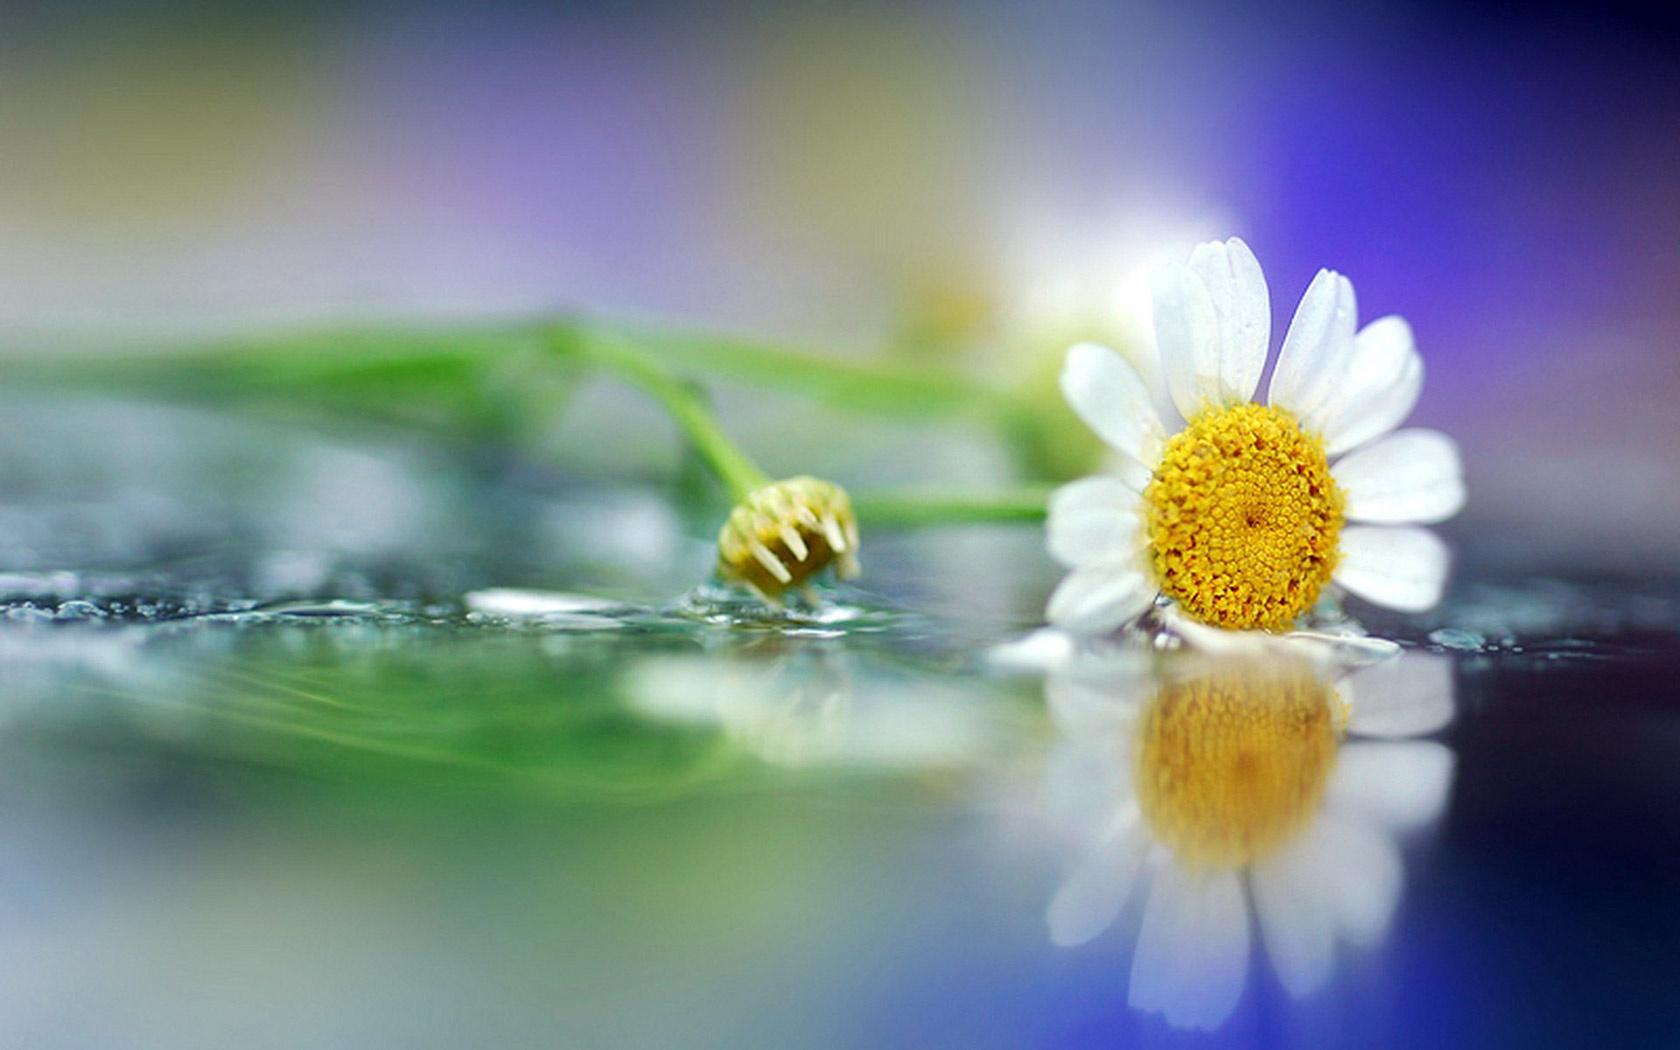 hinh anh hoa cuc dep 11